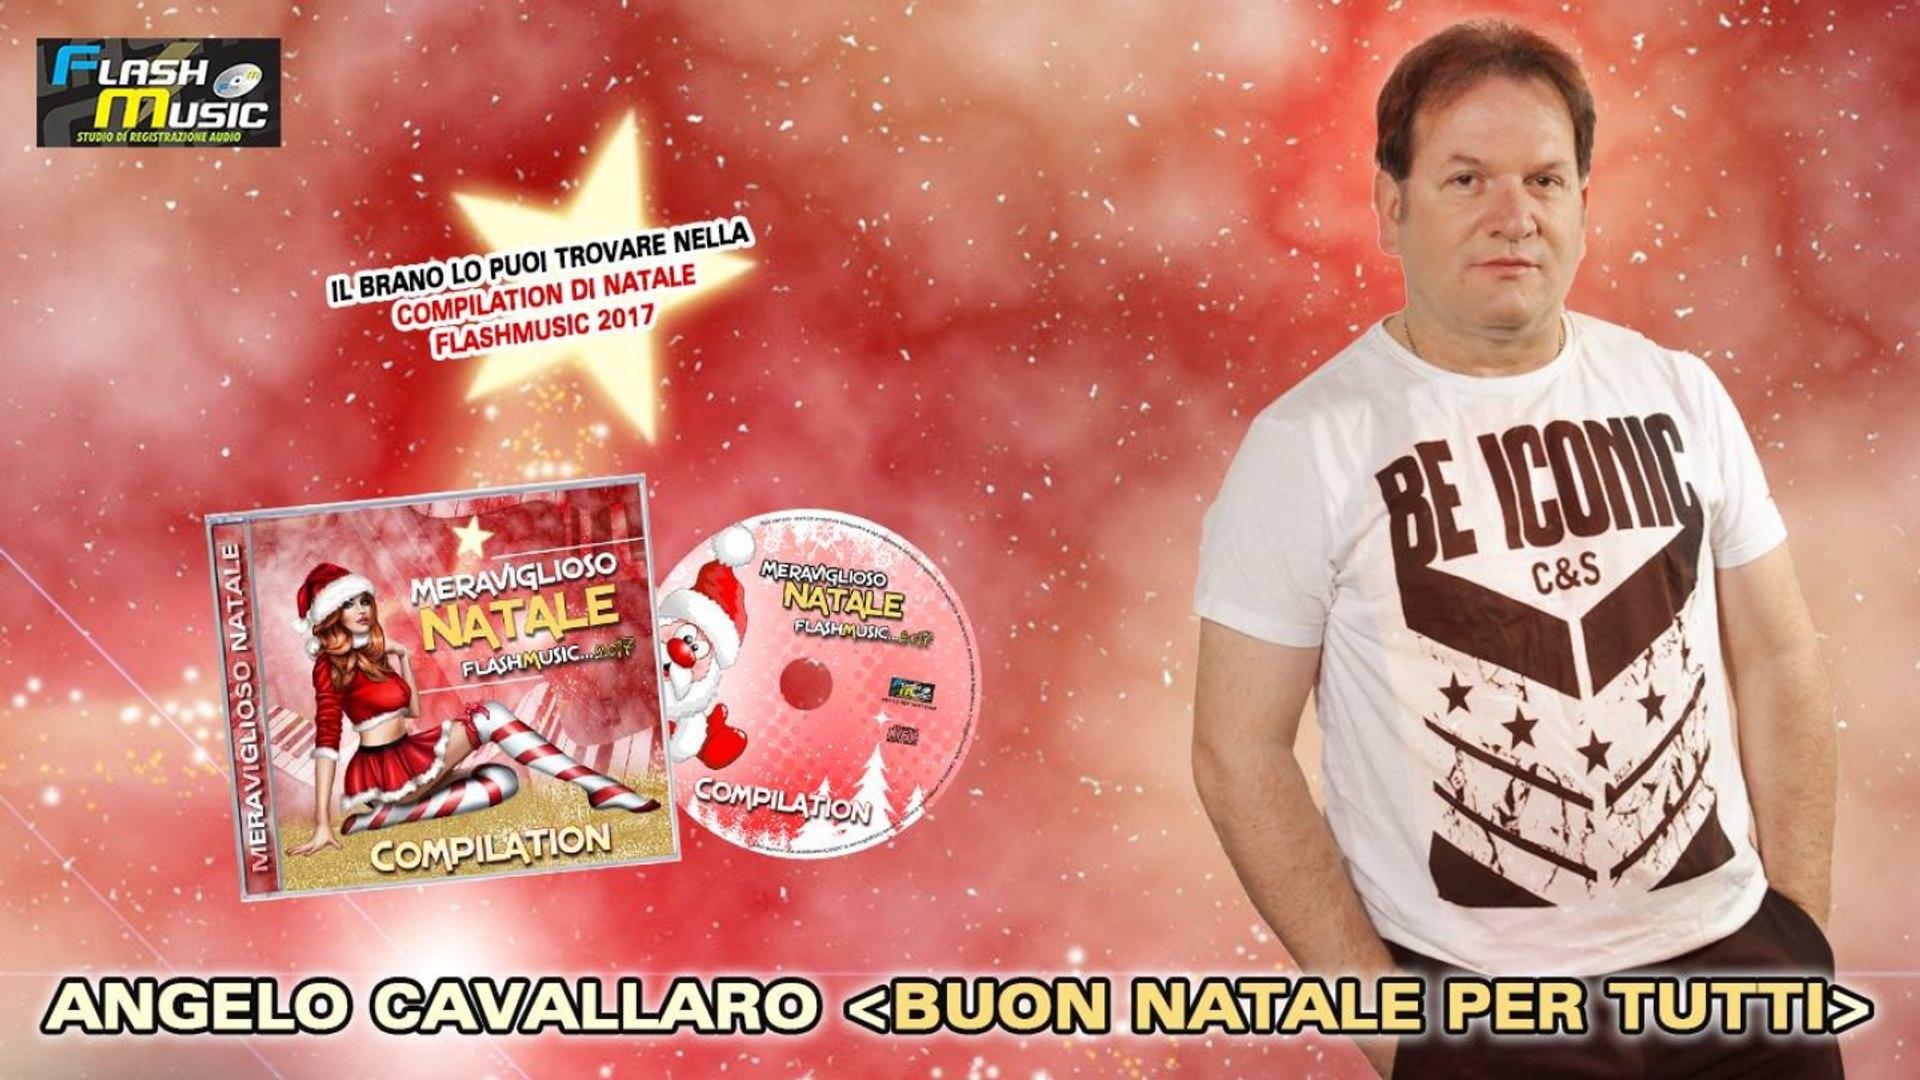 Angelo Cavallaro Buon Natale.Angelo Cavallaro Buon Natale Per Tutti Video Dailymotion